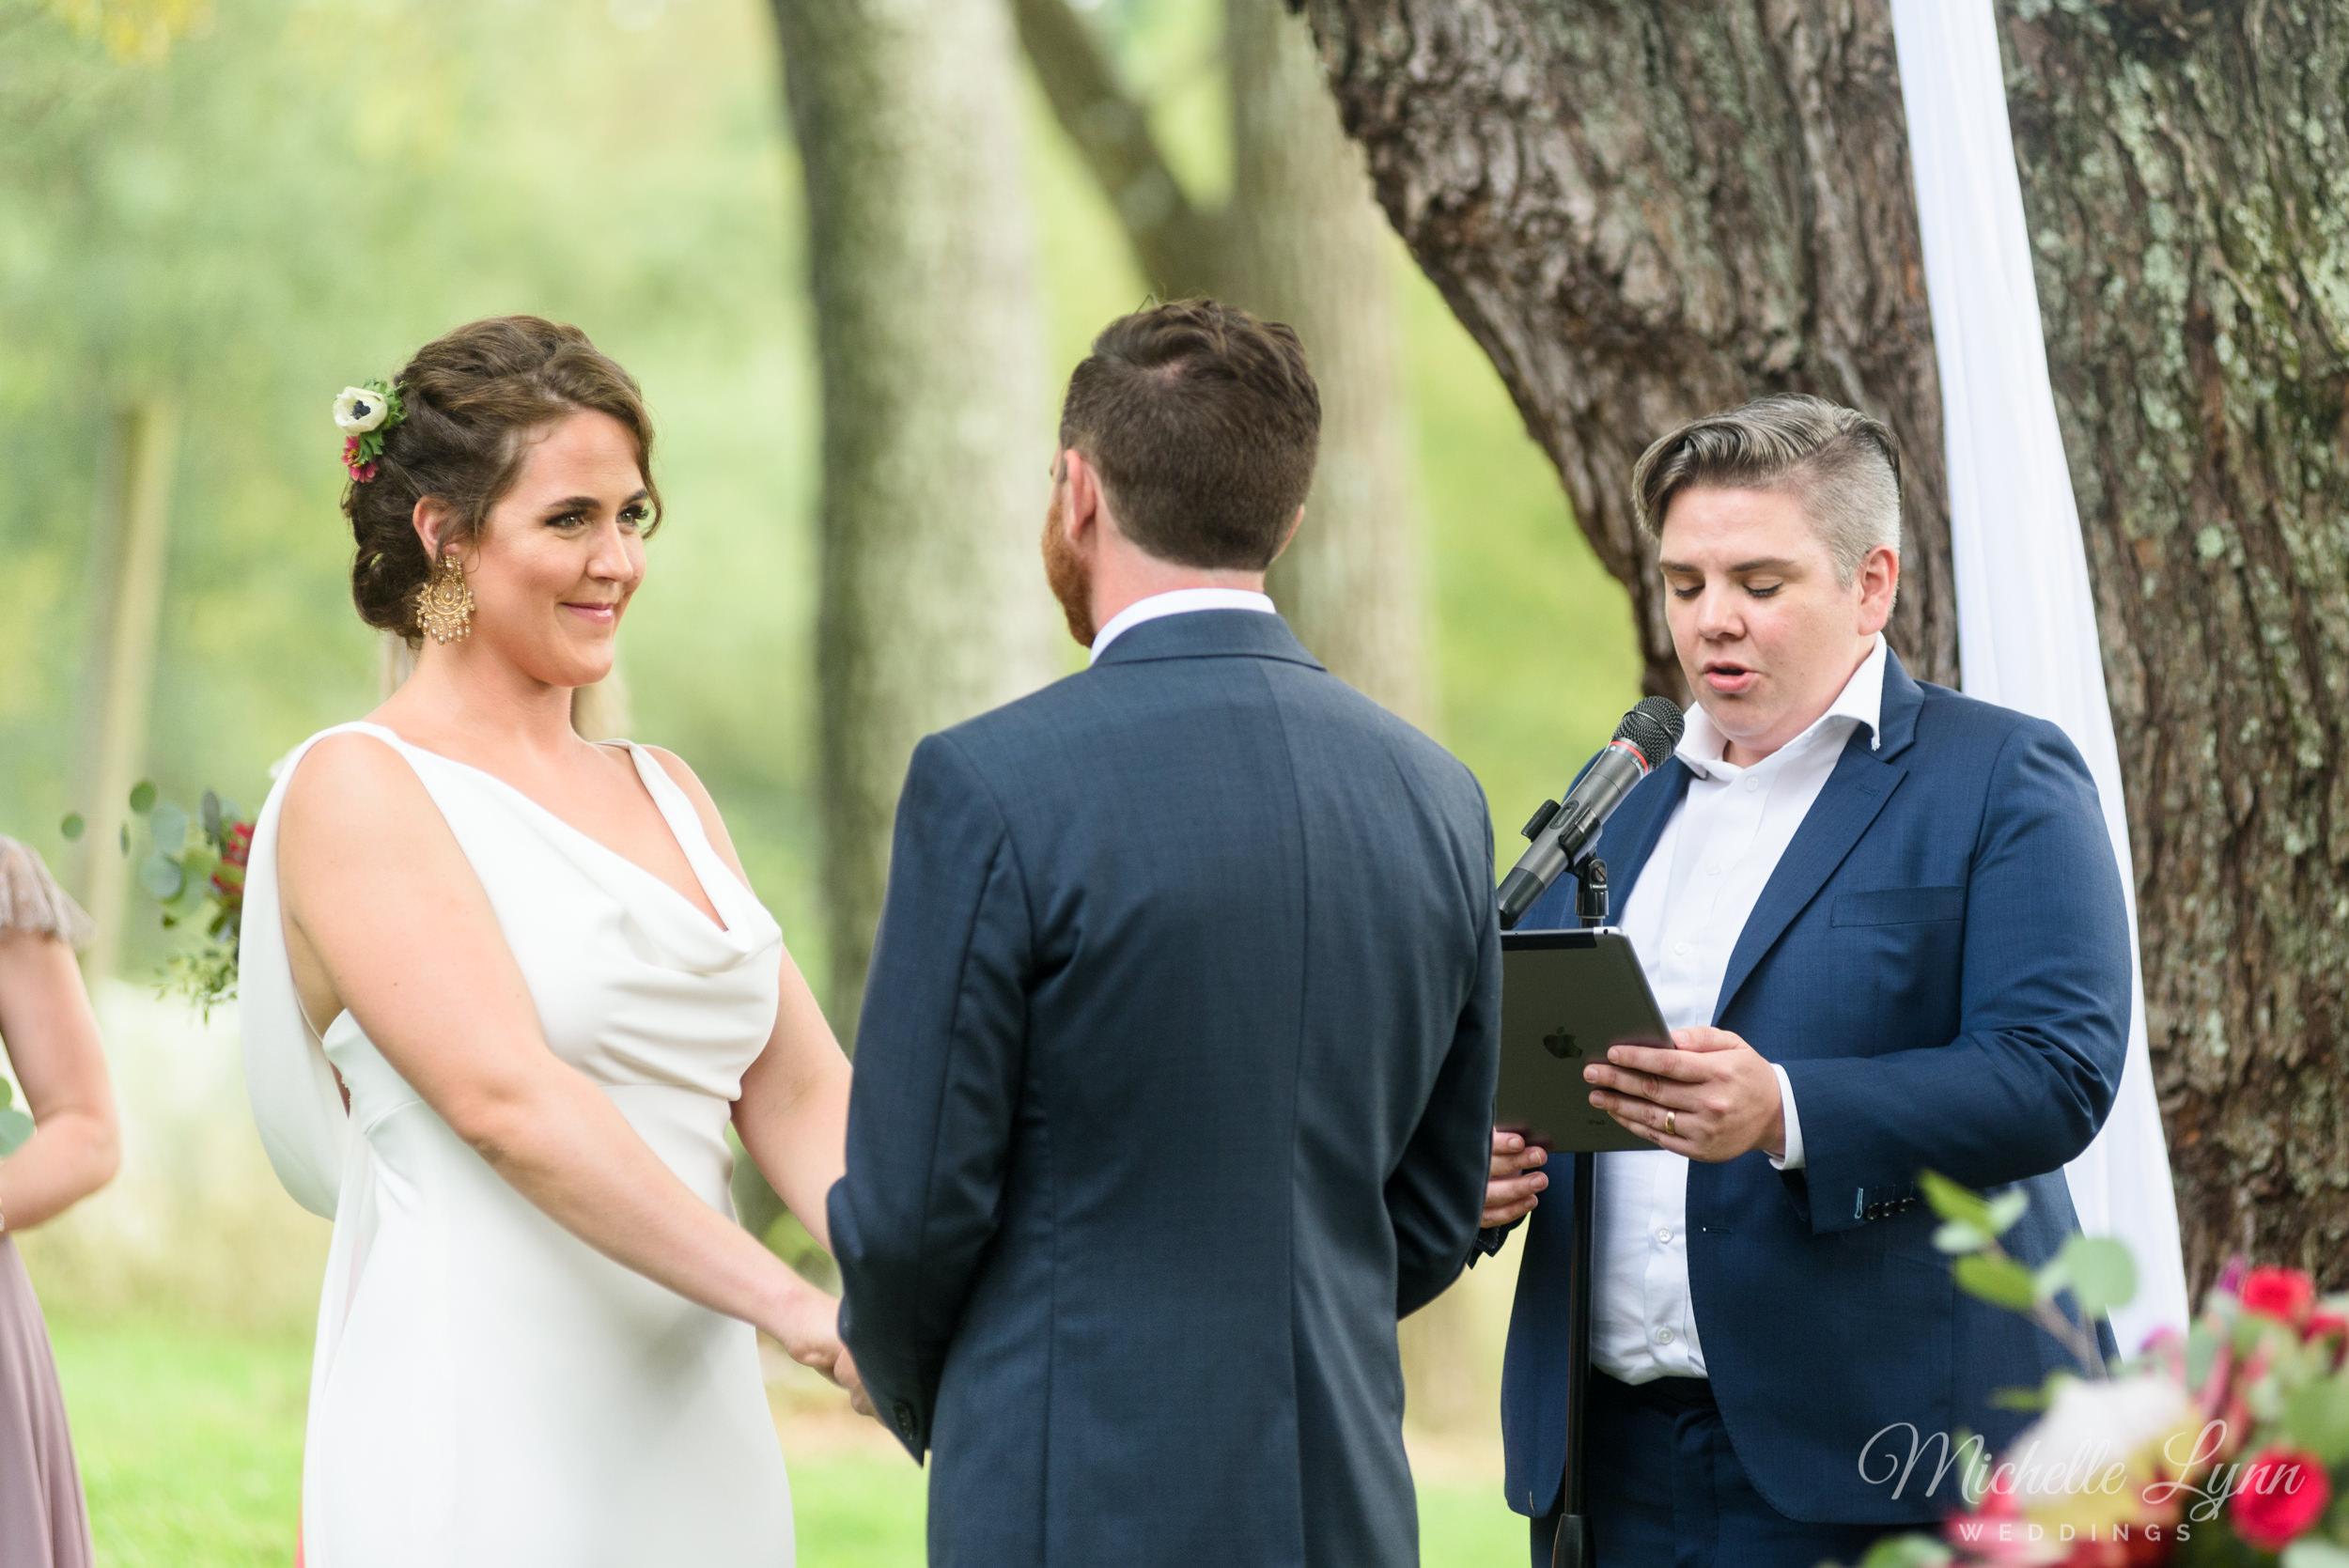 mlw-unionville-vineyards-nj-wedding-photography-38.jpg